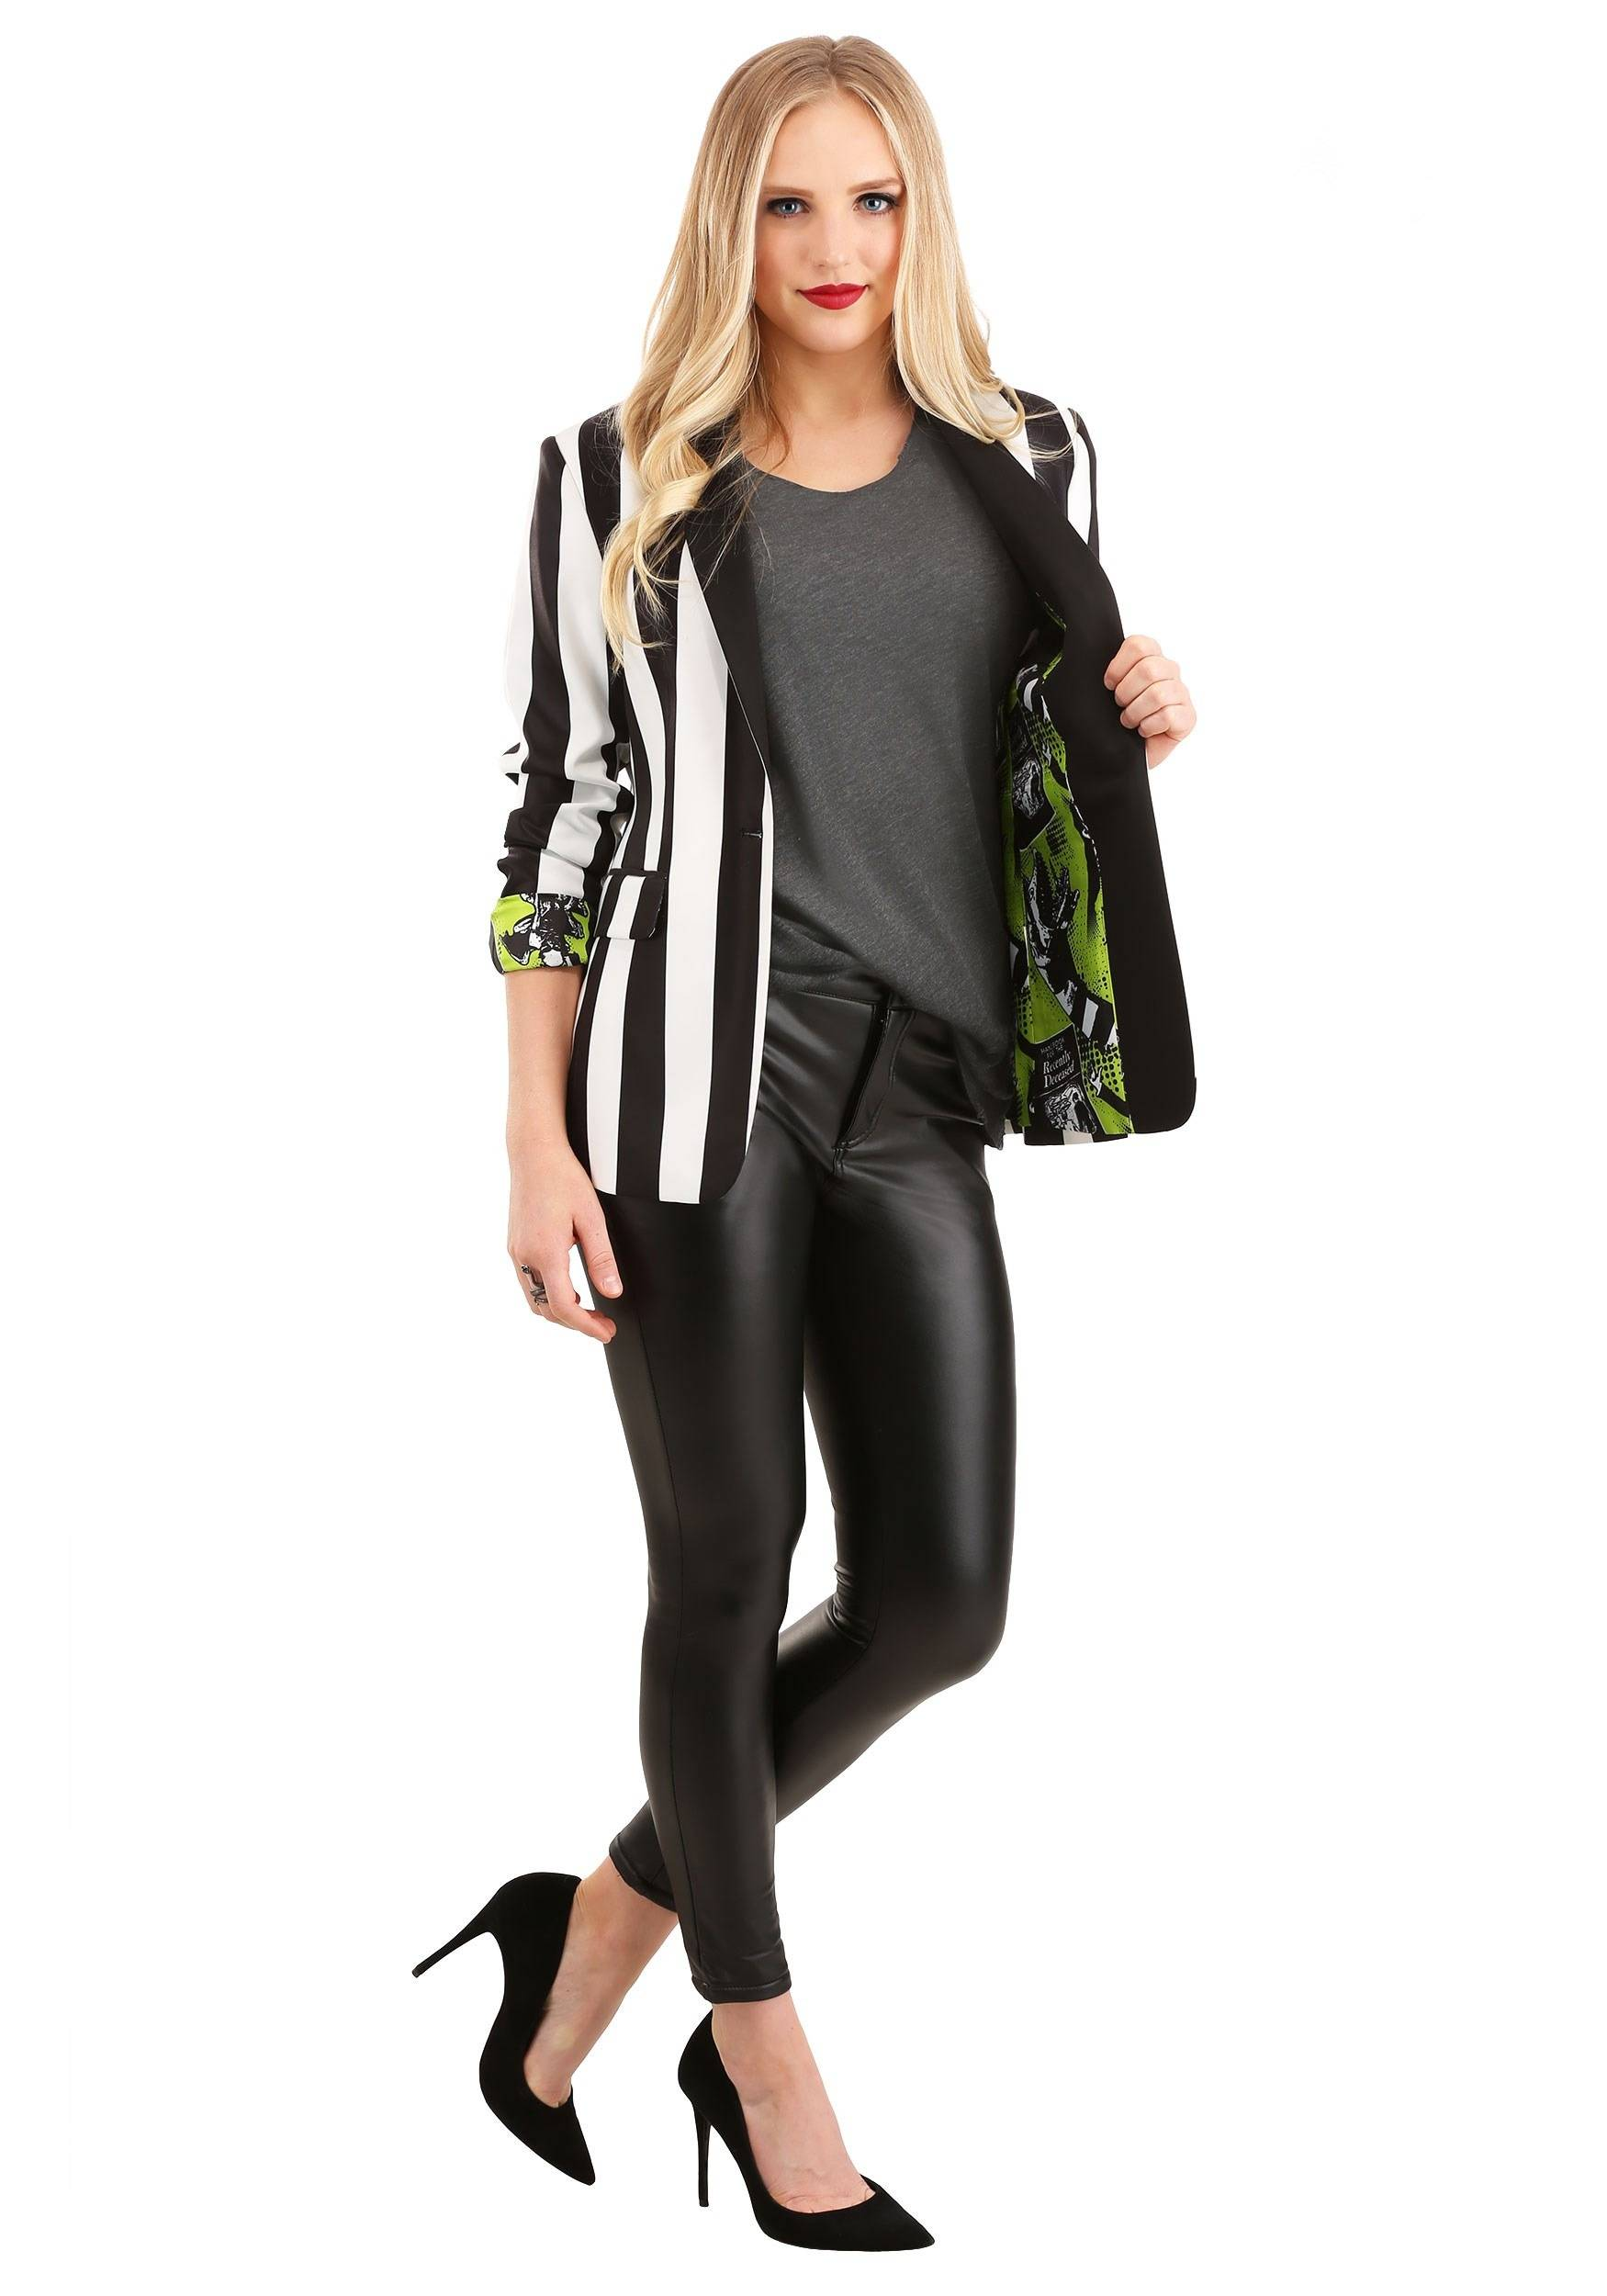 FUN Suits Beetlejuice Suit Blazer for Women   Halloween Clothing  - Black/White - Size: 28